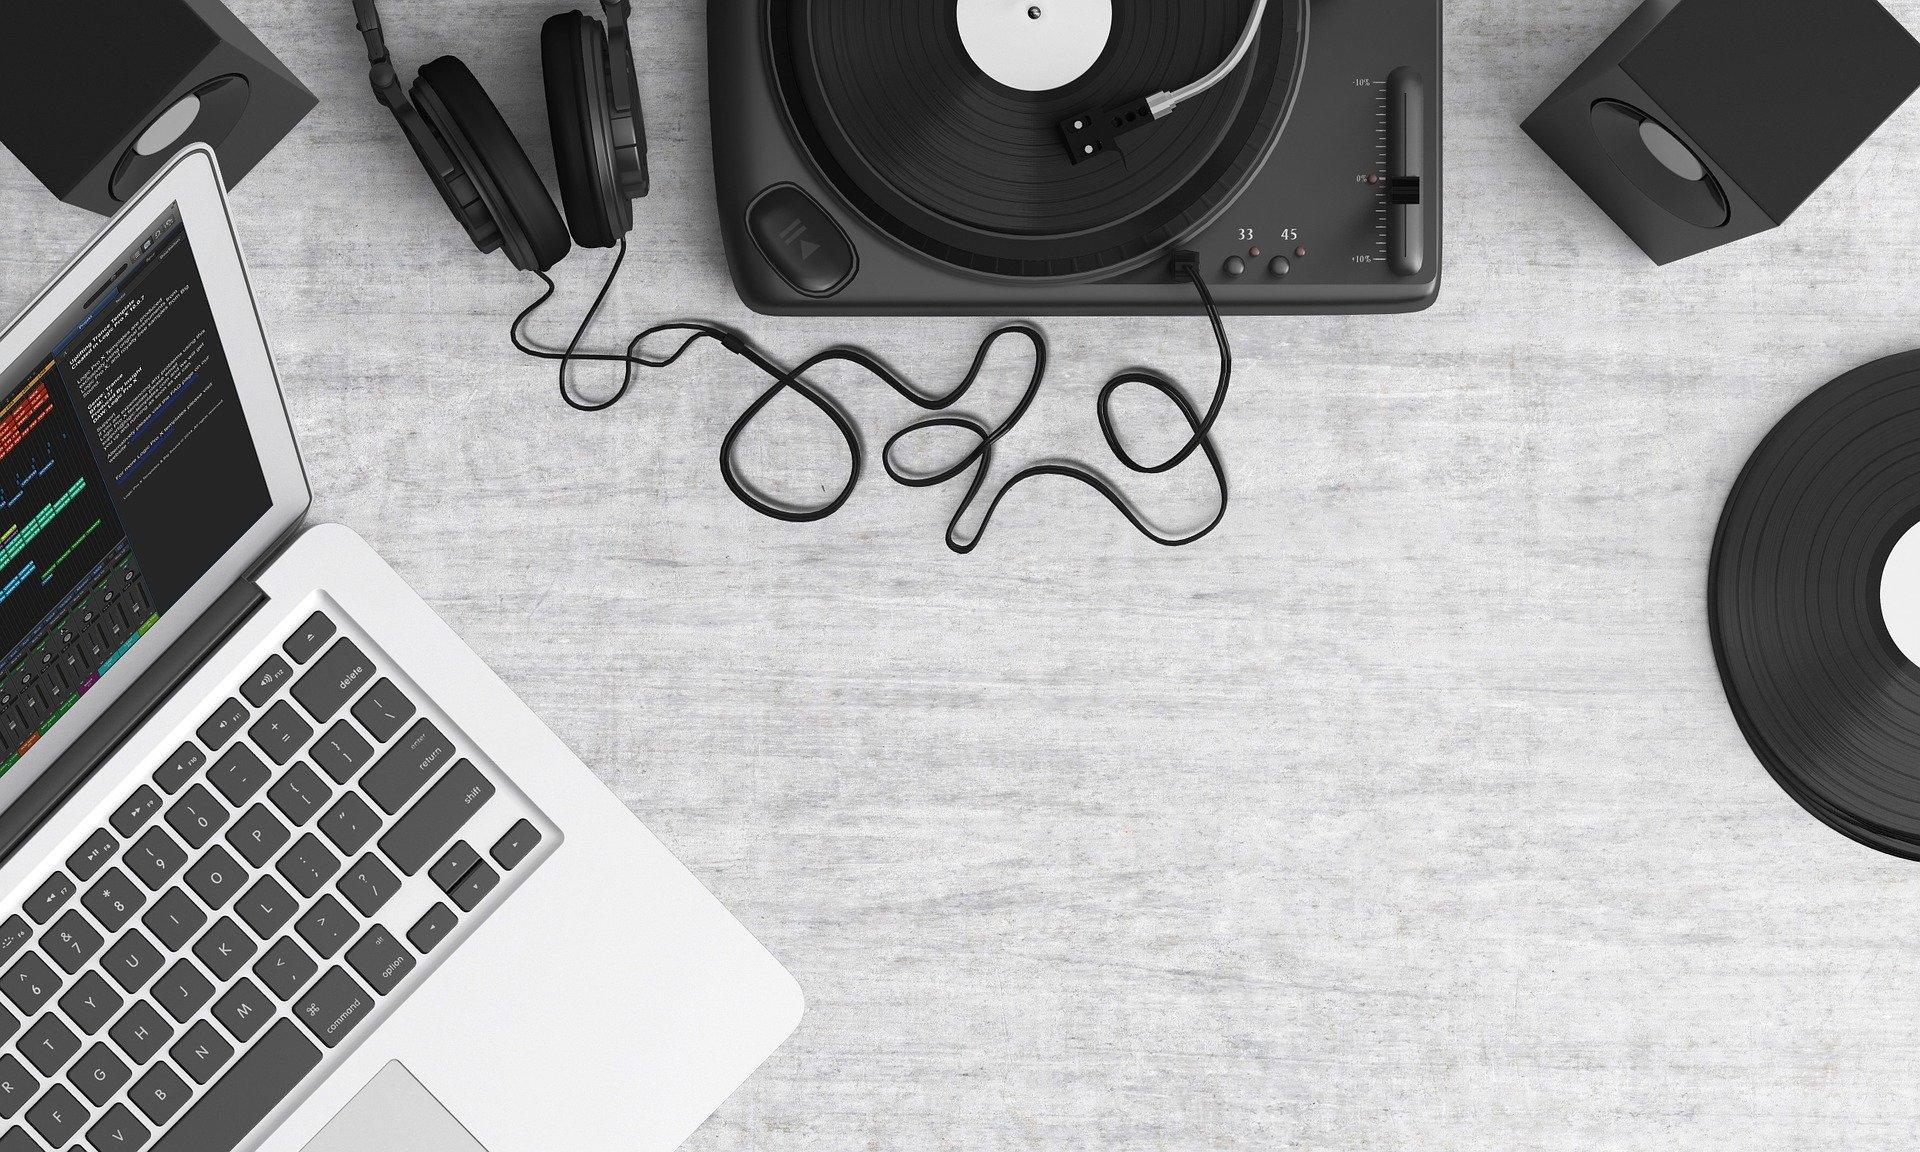 5000 HQ Playlist/Album/Artist Hits from Unique Listeners